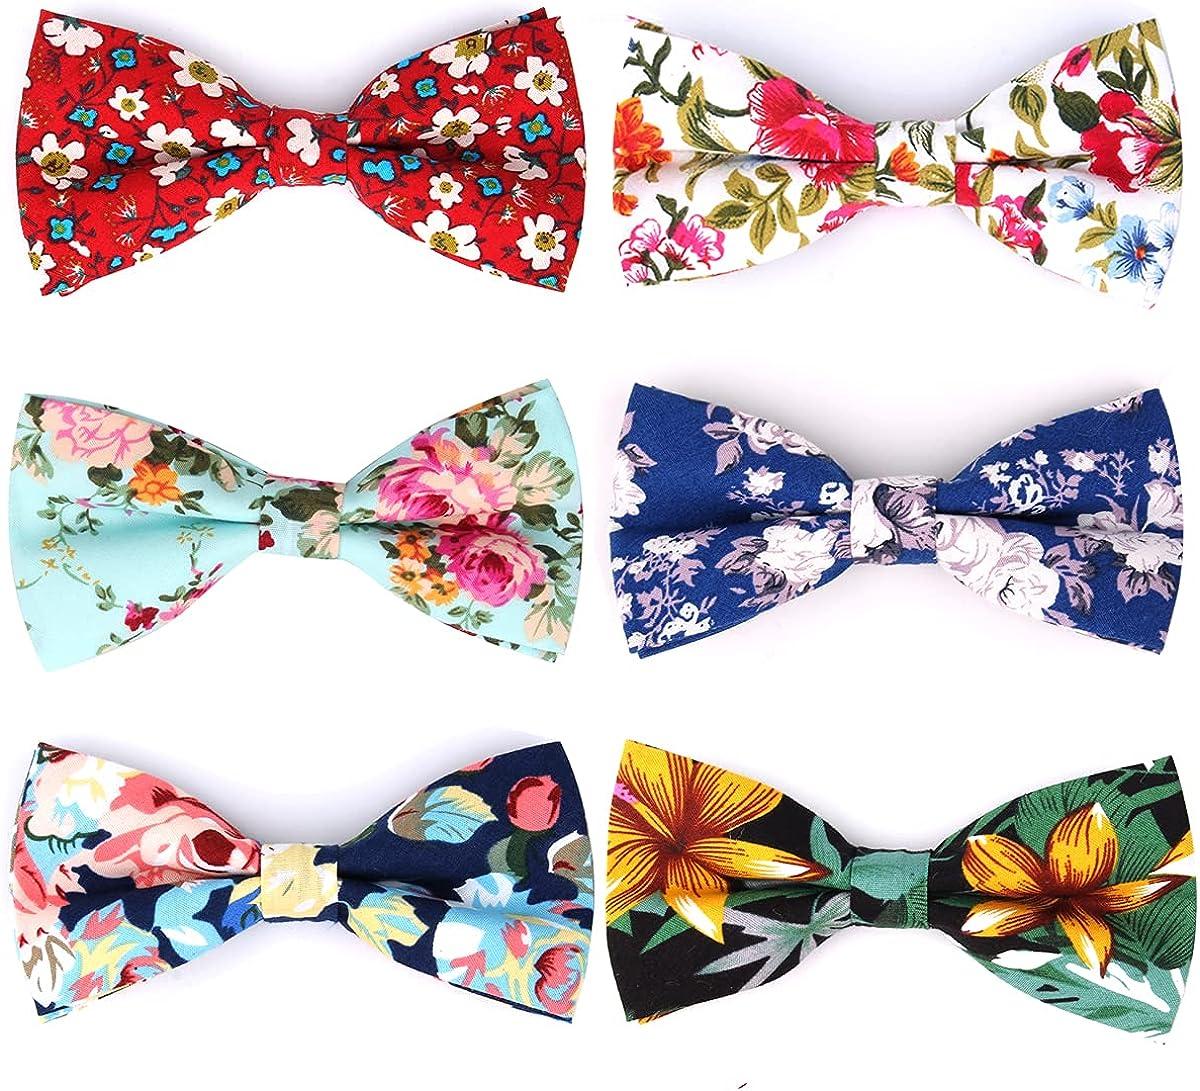 Gemay G.m Men's Bow ties Adjustable Pre-tied Bow-ties For Men Boys Wedding Gifts (BT/W)